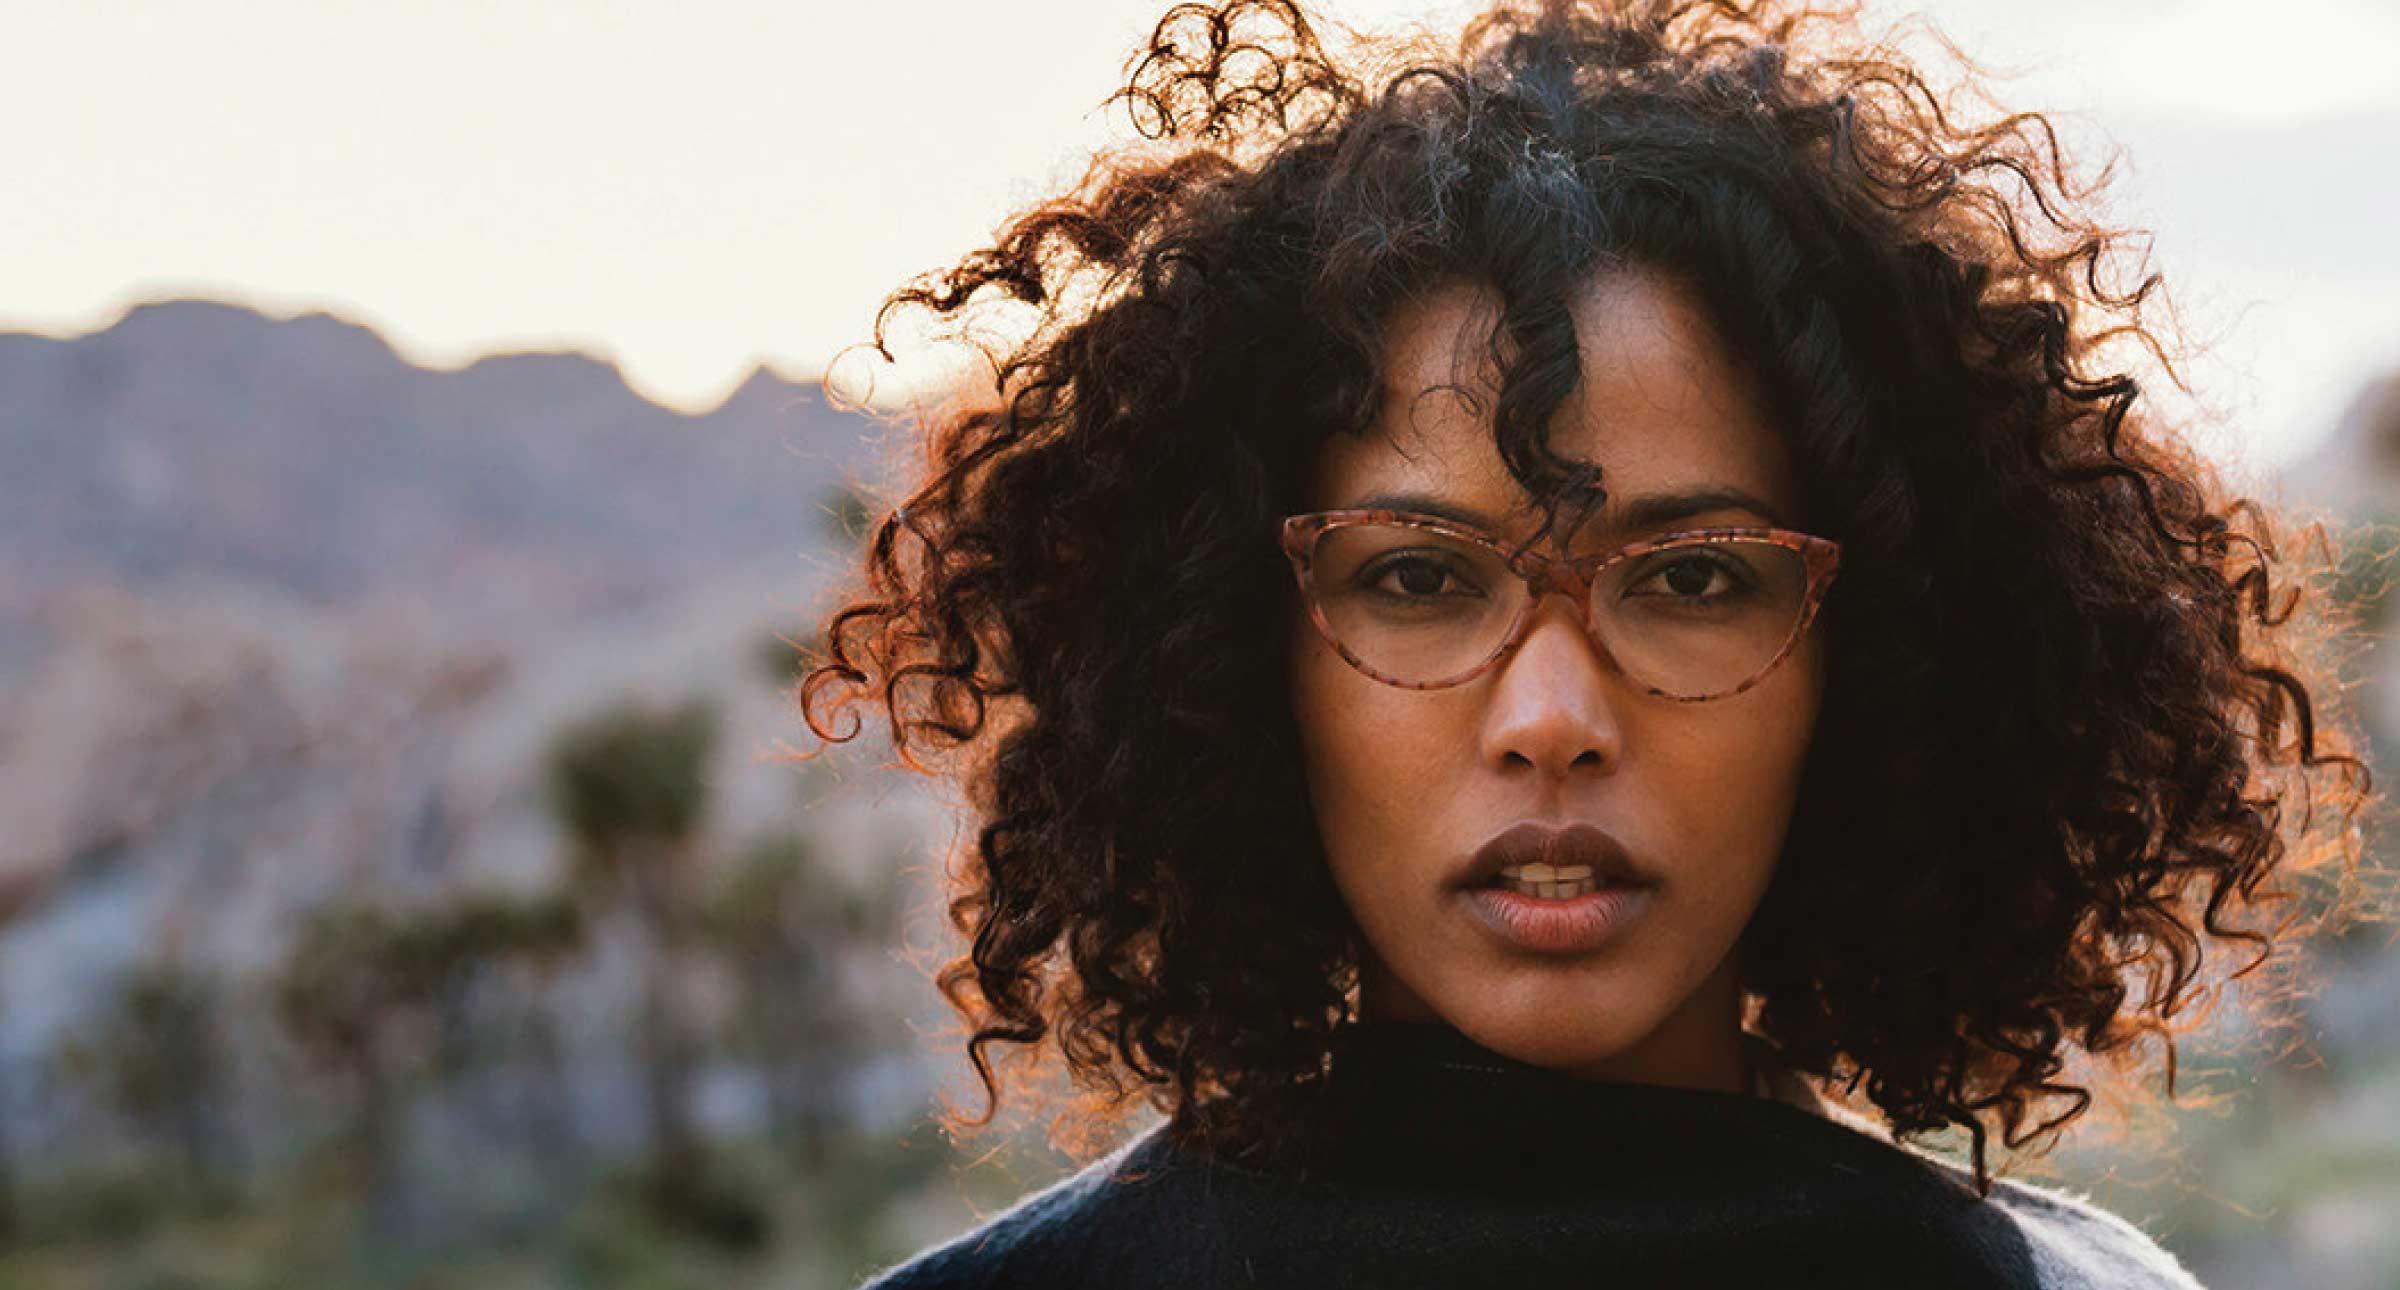 Women wearing Zenni Optical frames